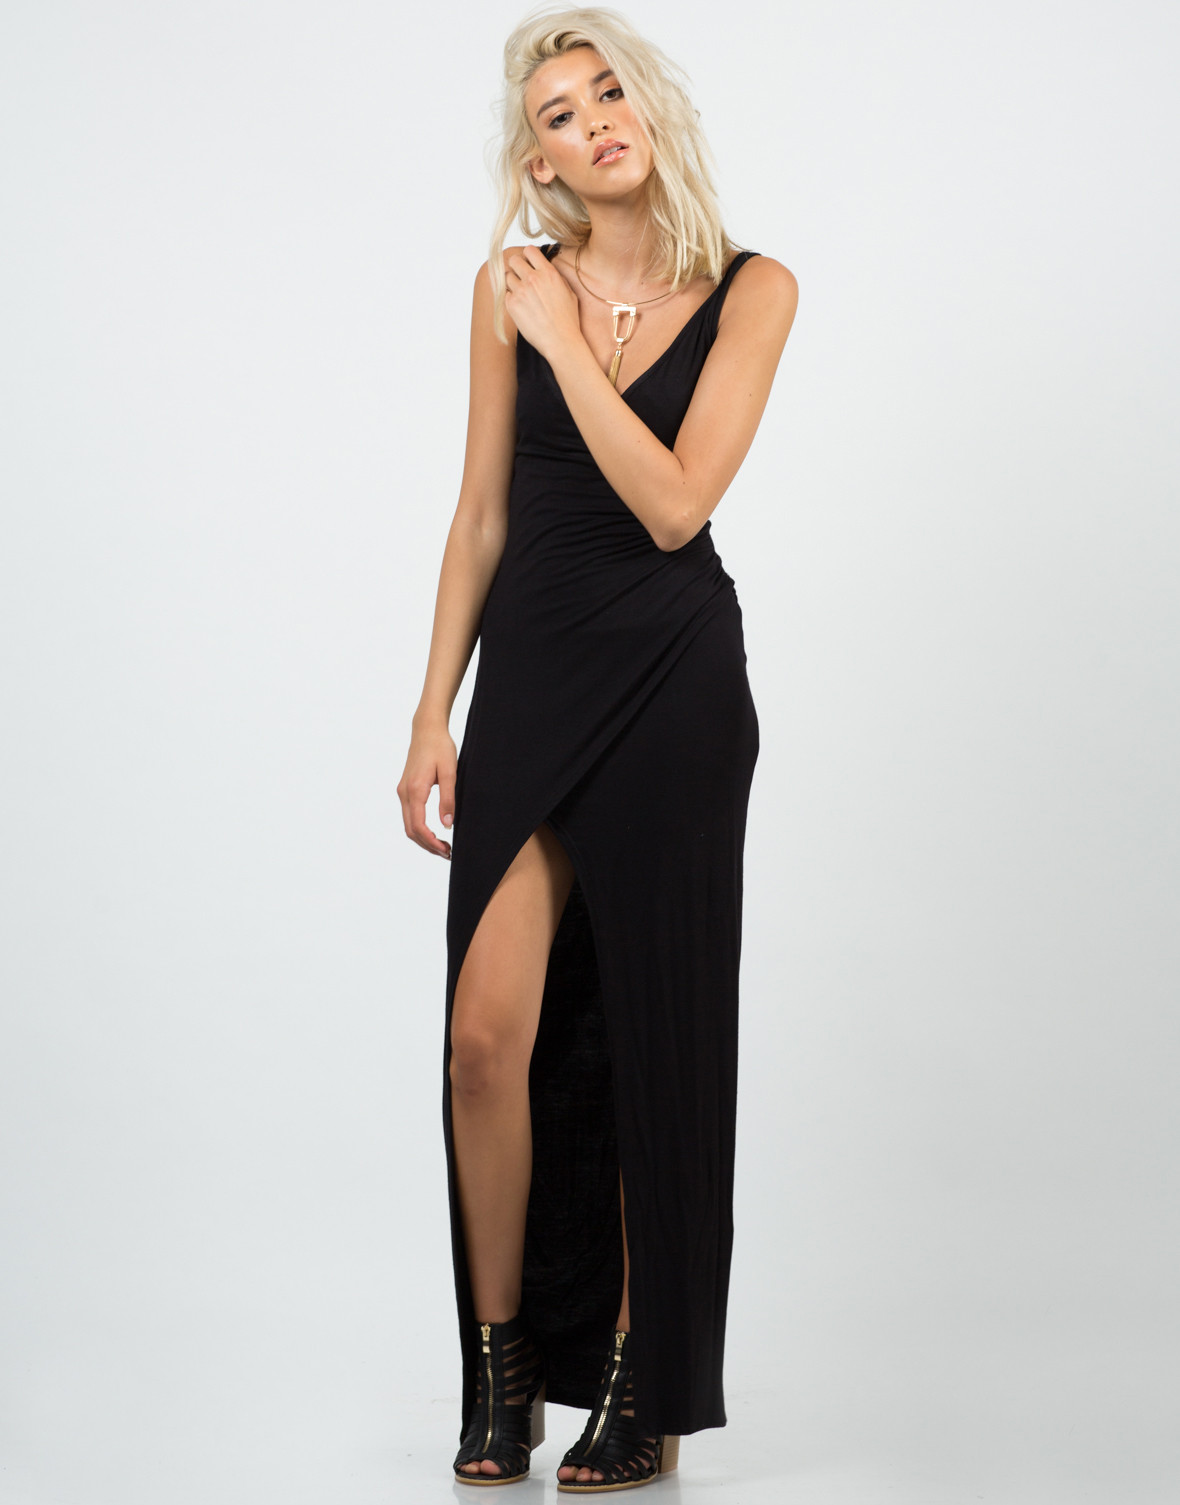 5 dresses to wear on summer wedding | Nakedlydressed